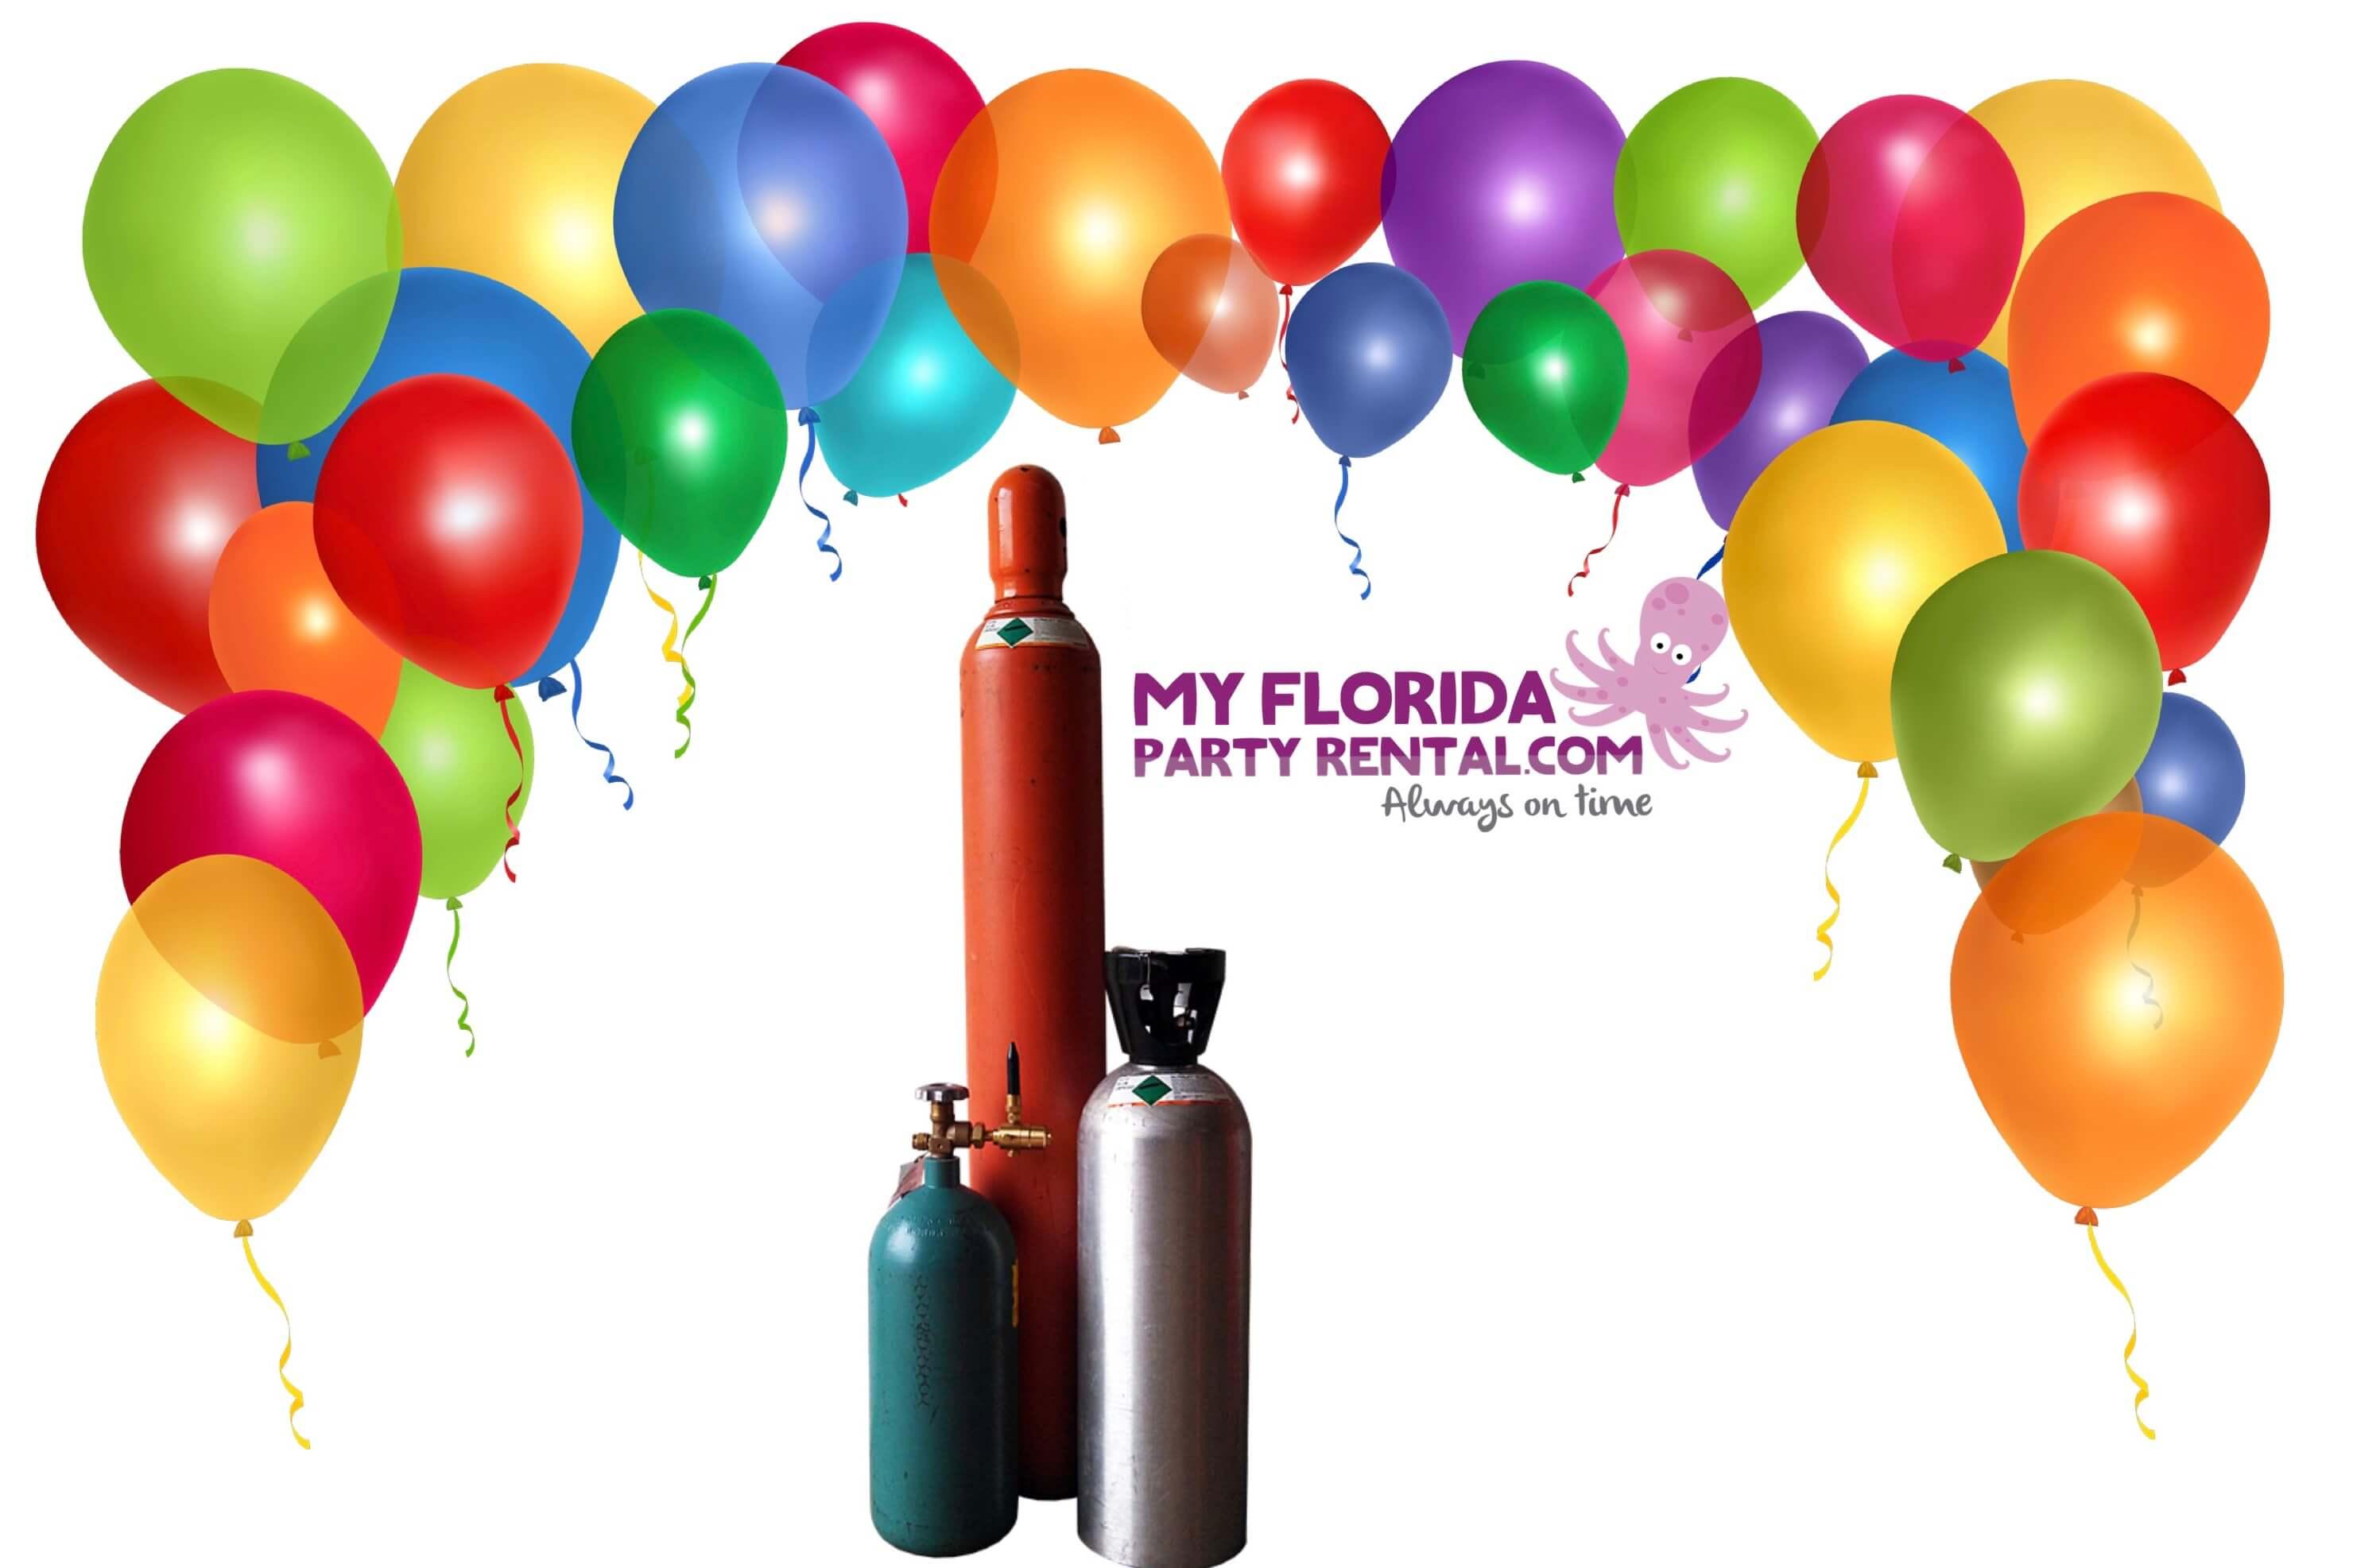 Helium Tank Rental Miami Fort Lauderdale Helium Tank Rentals